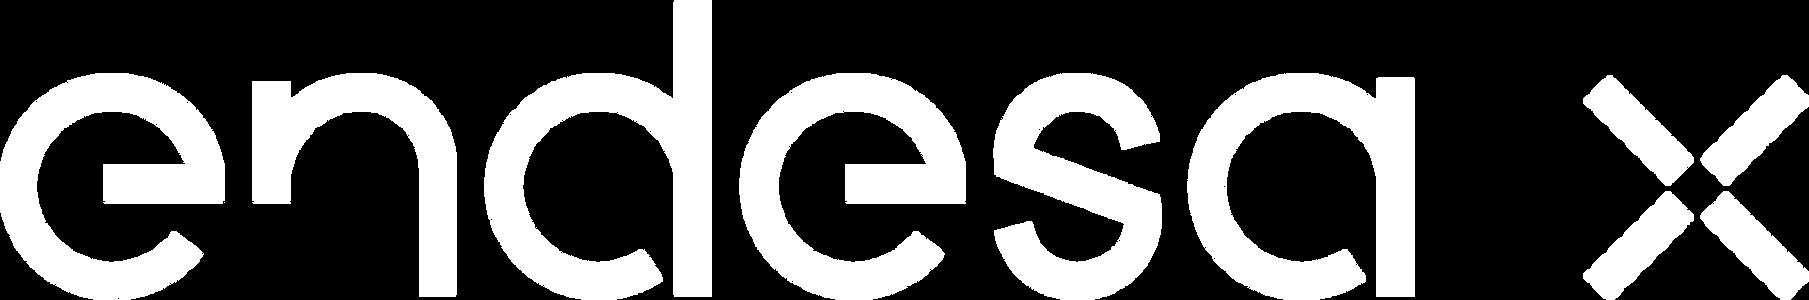 endesa x_logo blanco.png